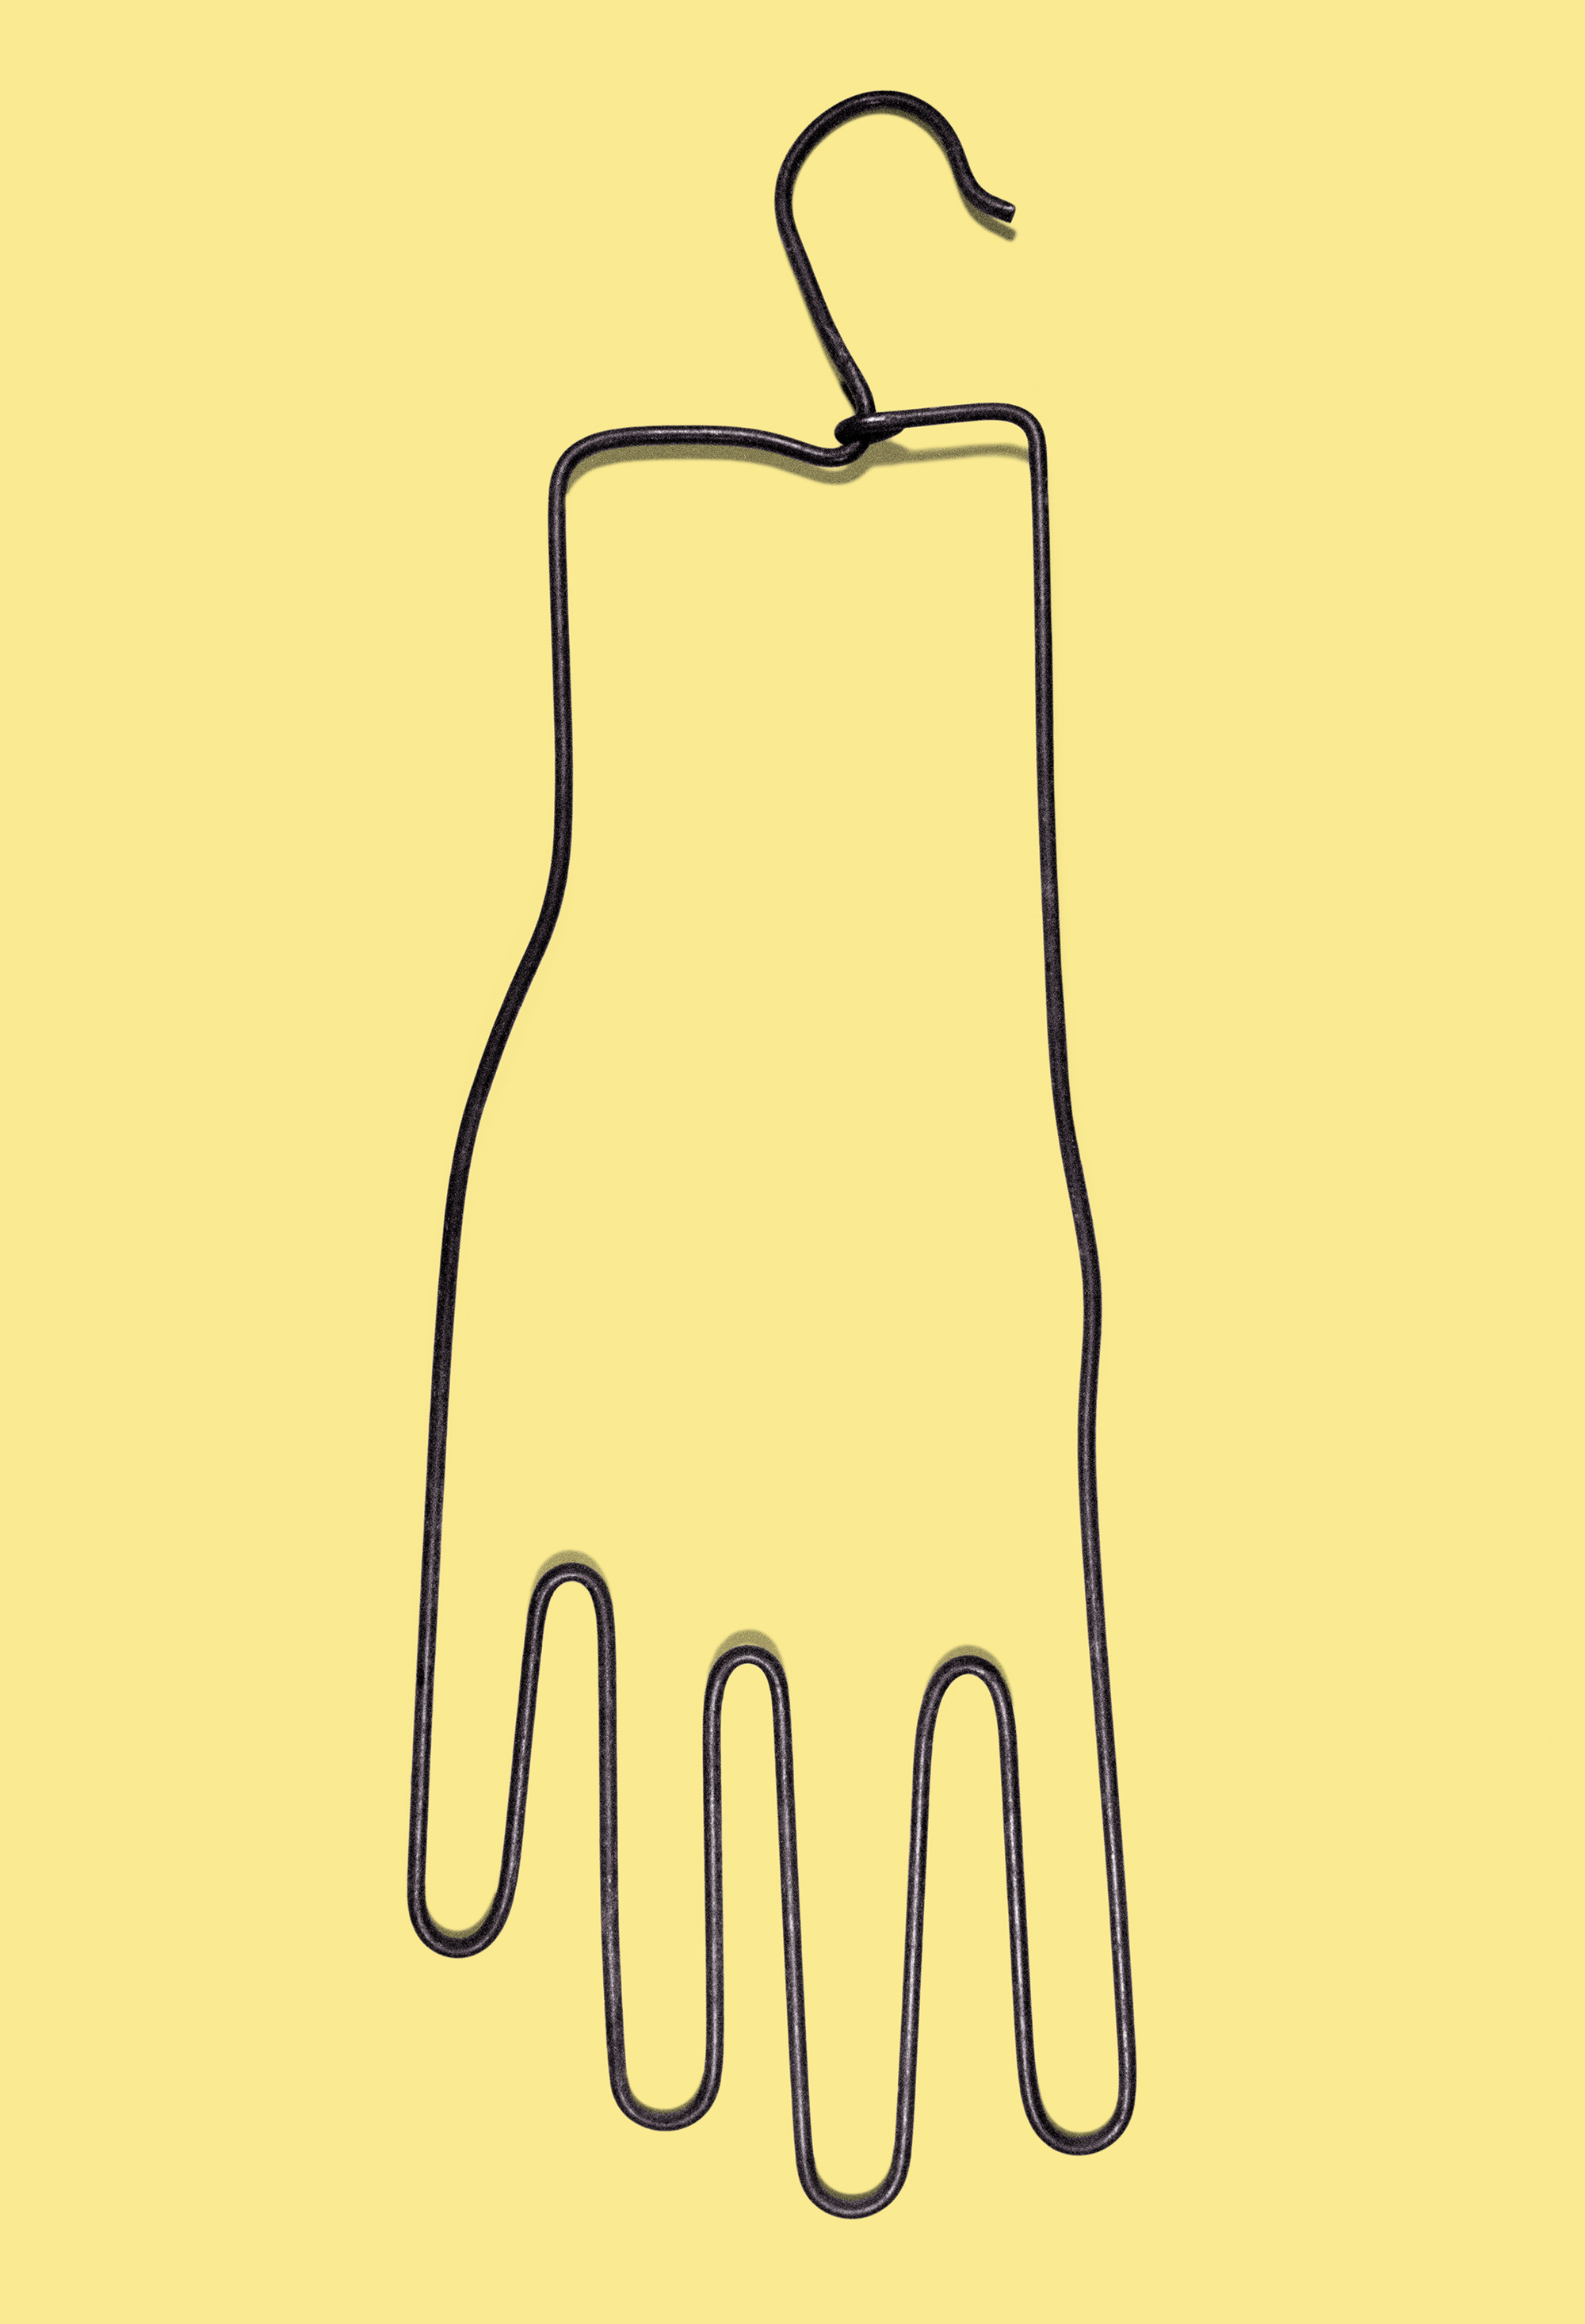 yellow, hands up, object, available artwork, andrea van der straeten,